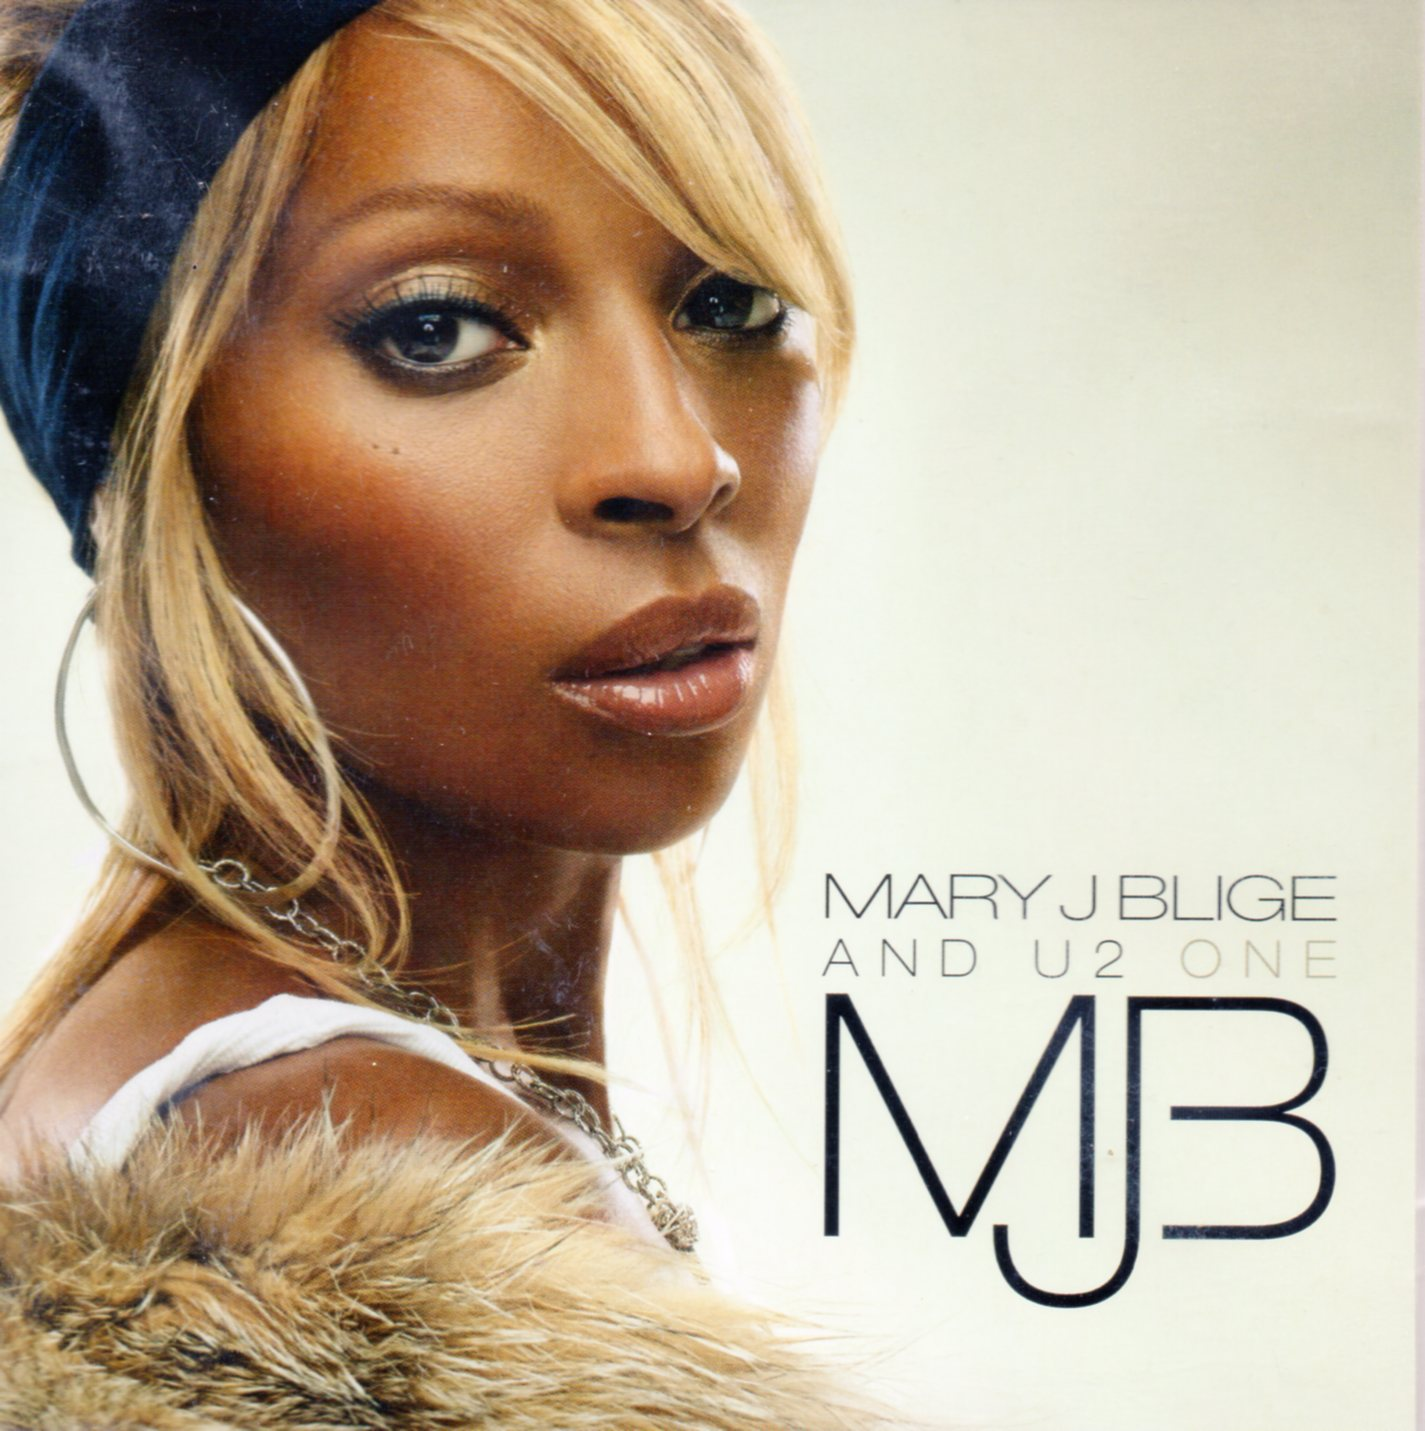 U2 & MARY J BLIGE - One 2-track CARD SLEEVE - CD single